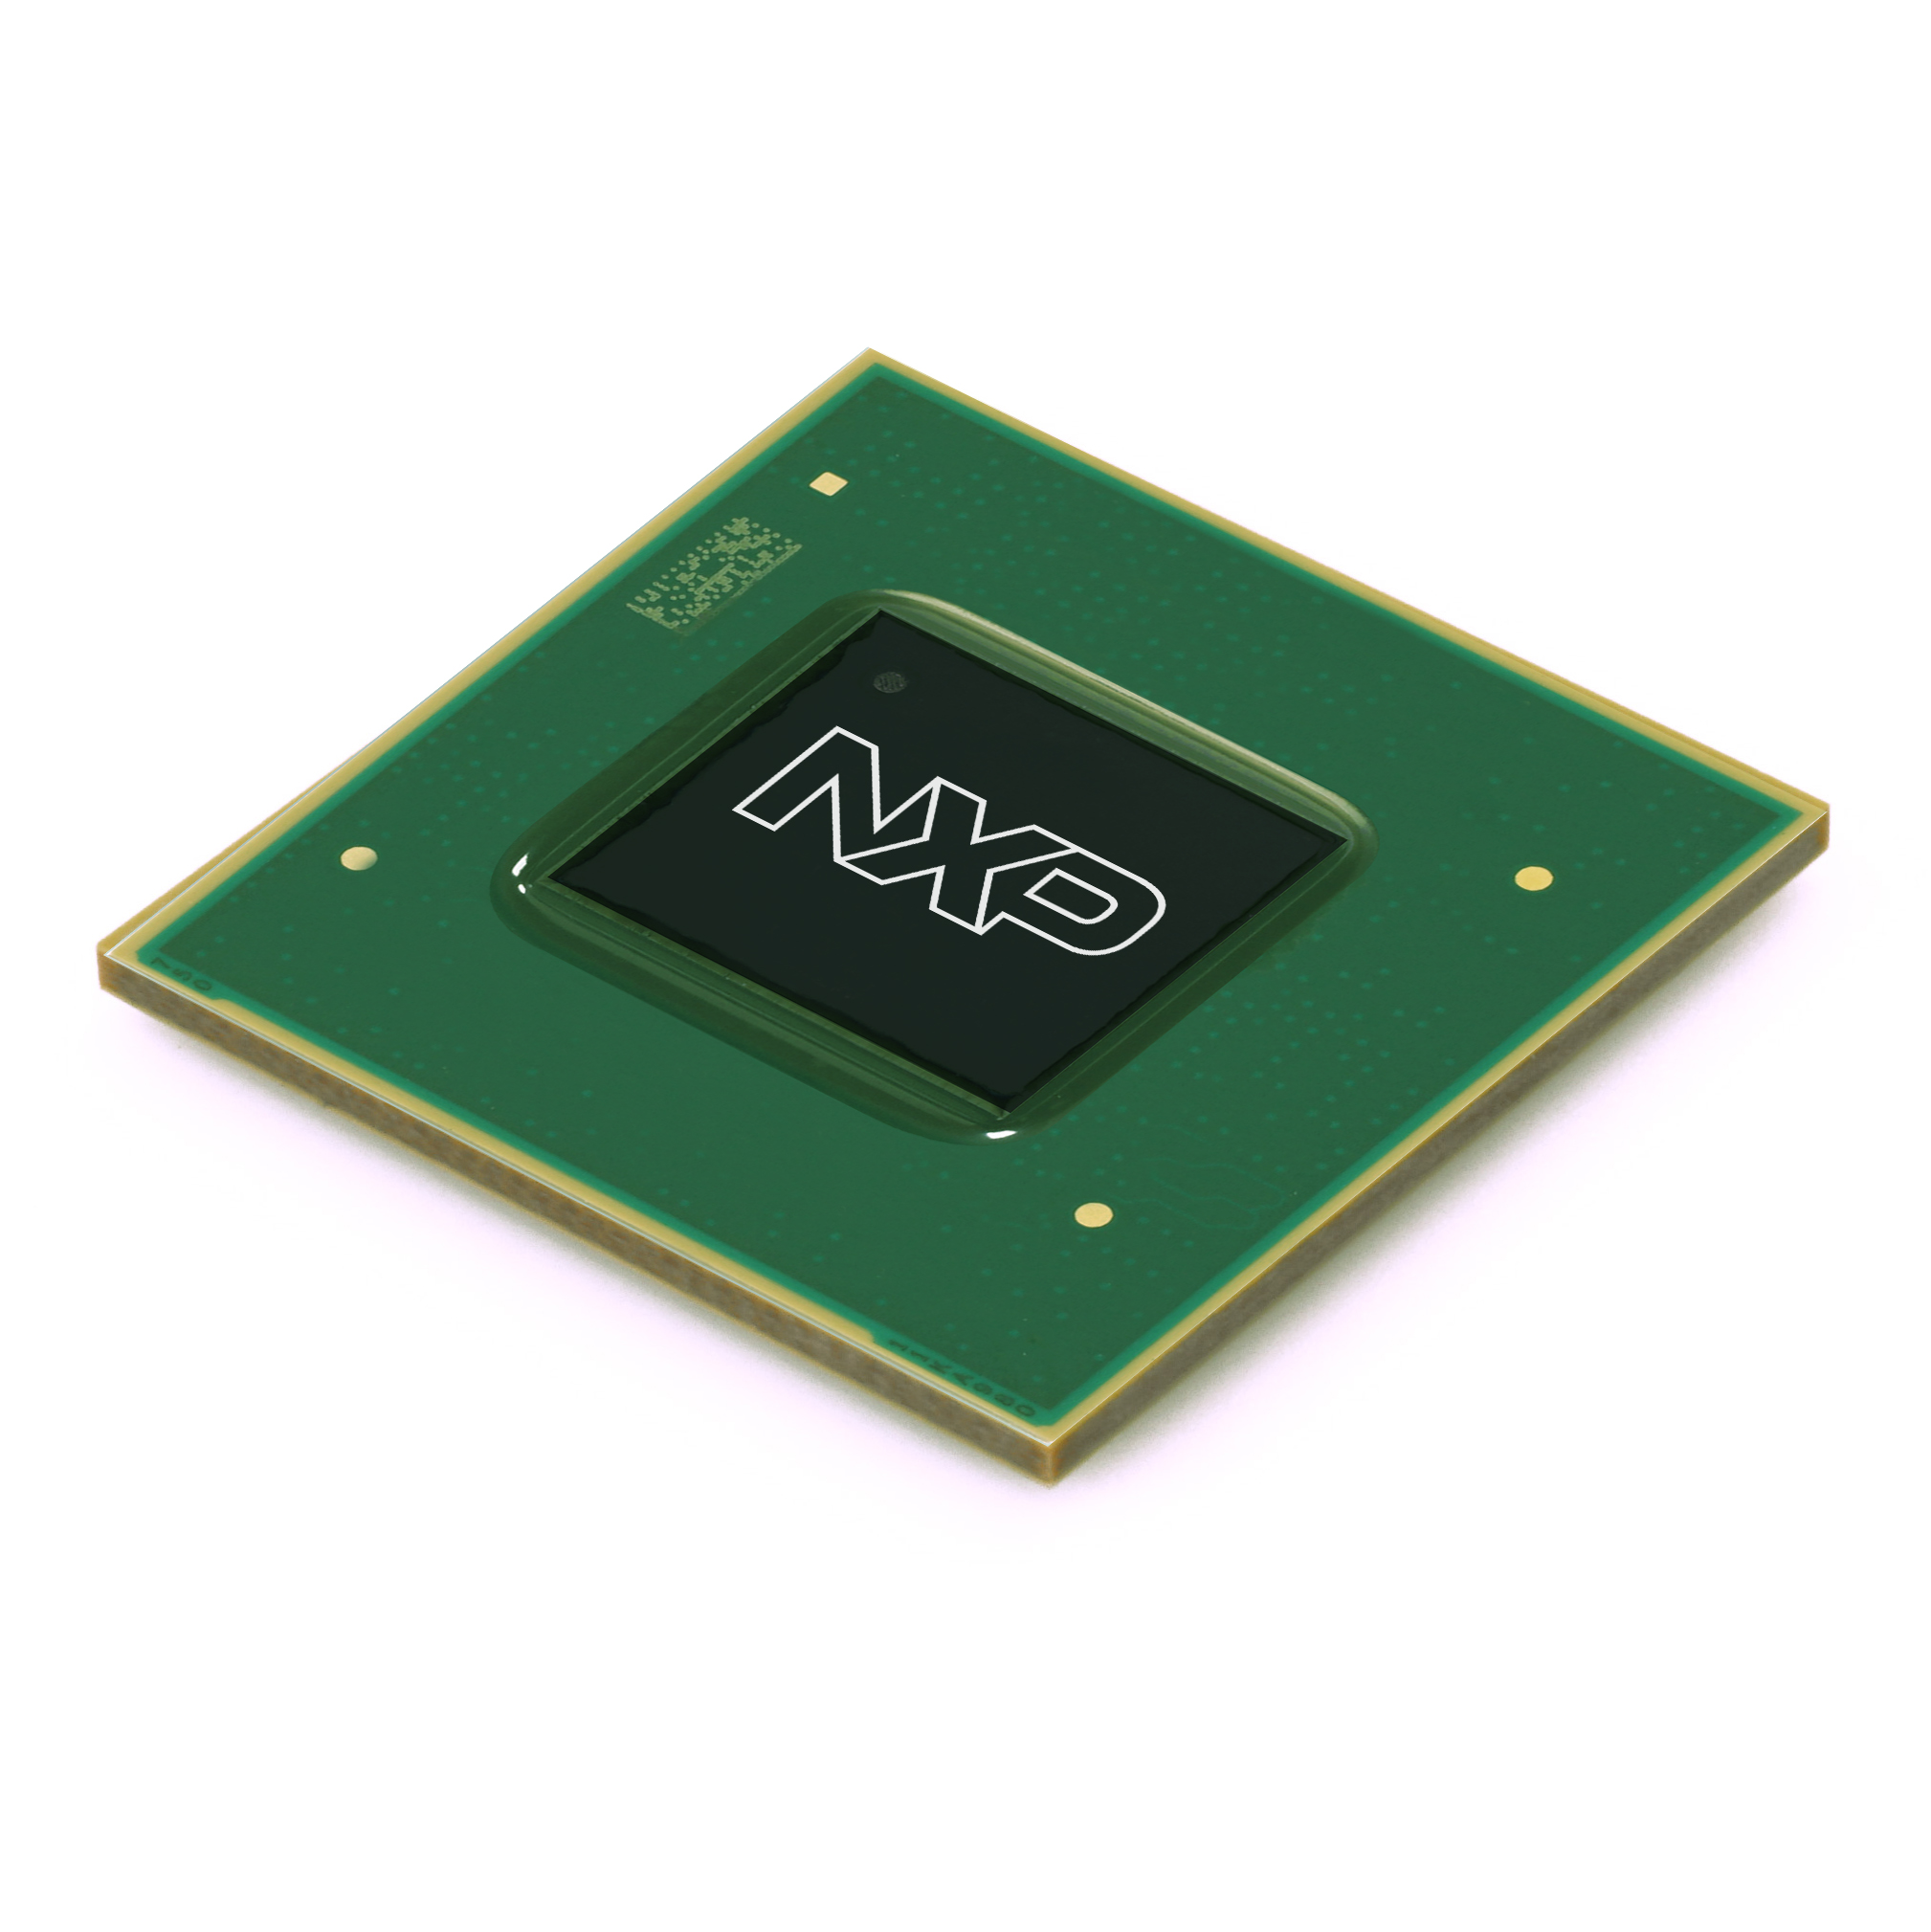 NXP i.MX 8M family of applications processors